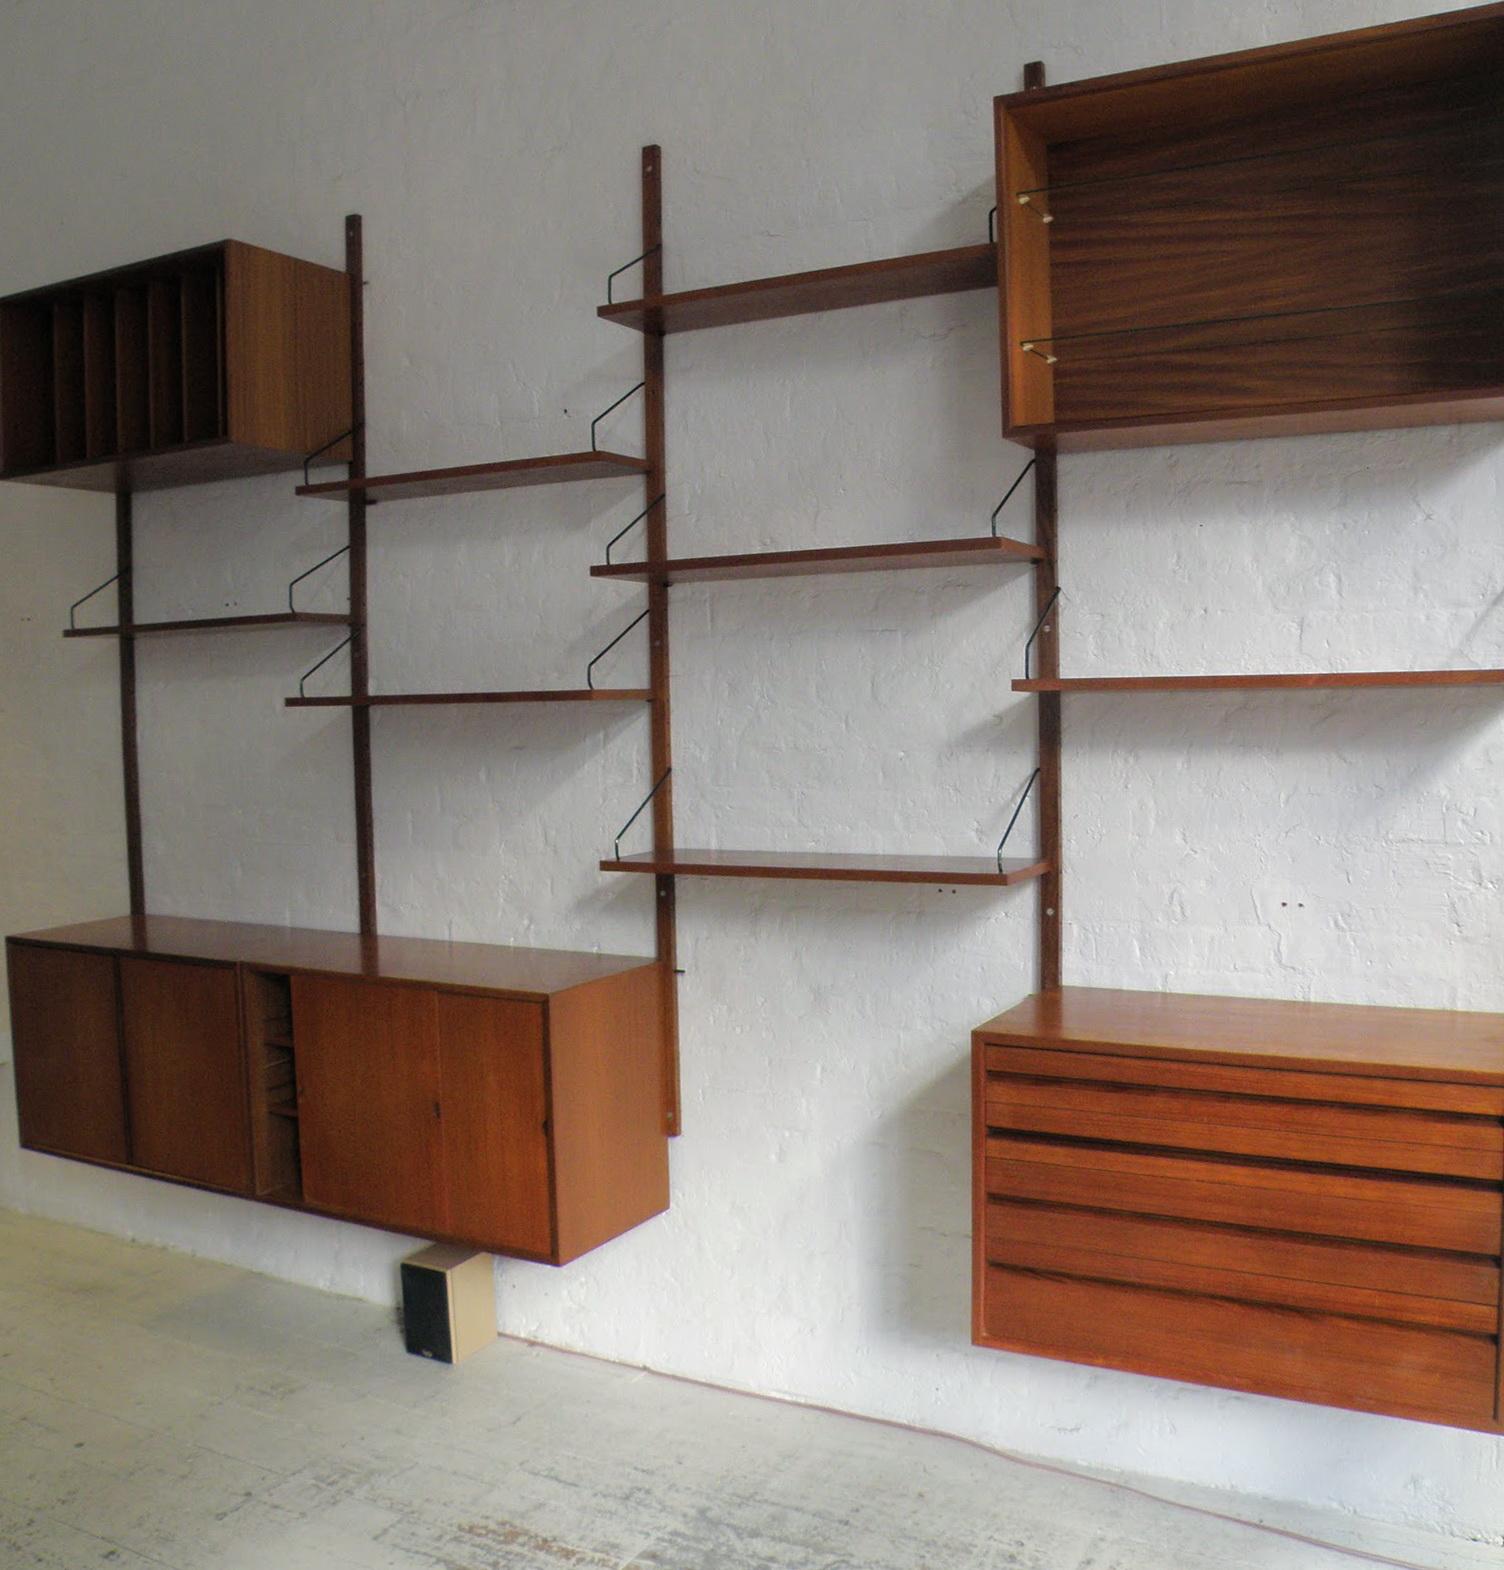 Wall Mounted Shelving Systems Ikea